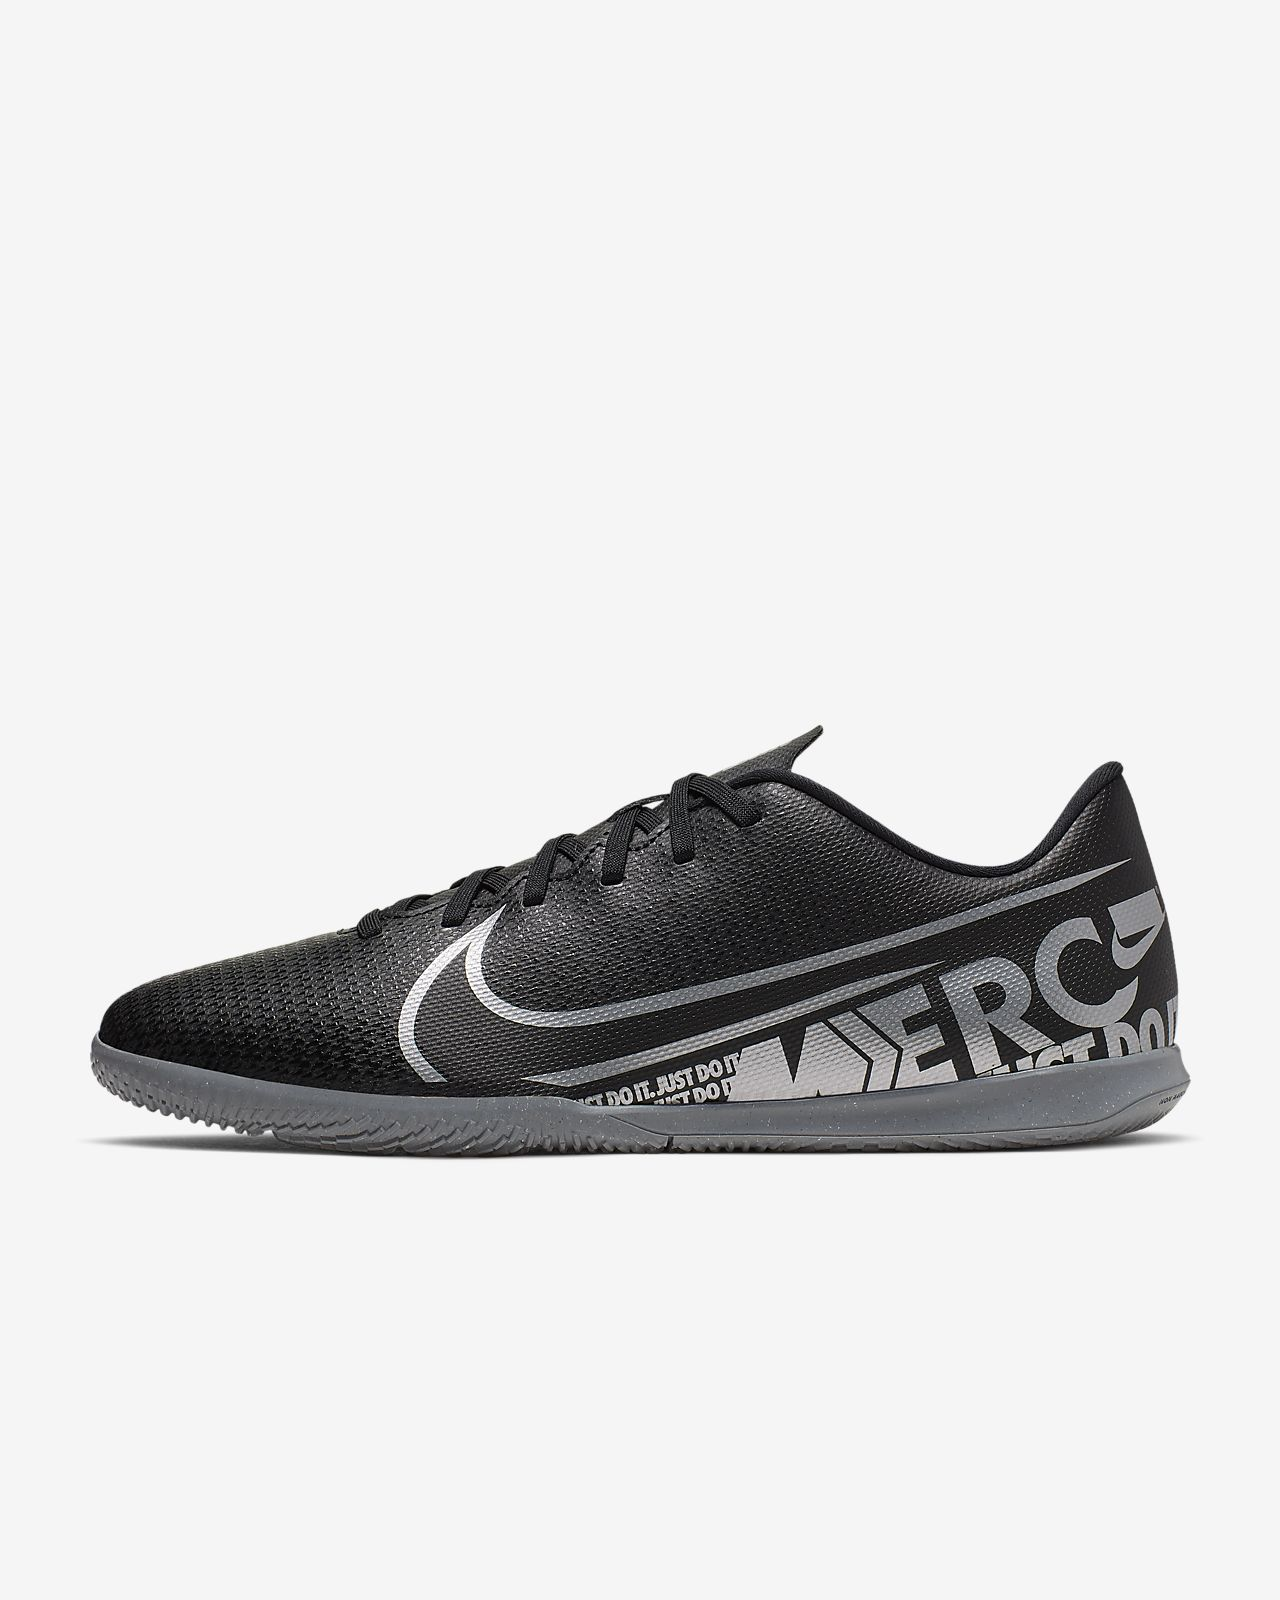 Nike Mercurial Vapor 13 Club IC Botas de fútbol sala